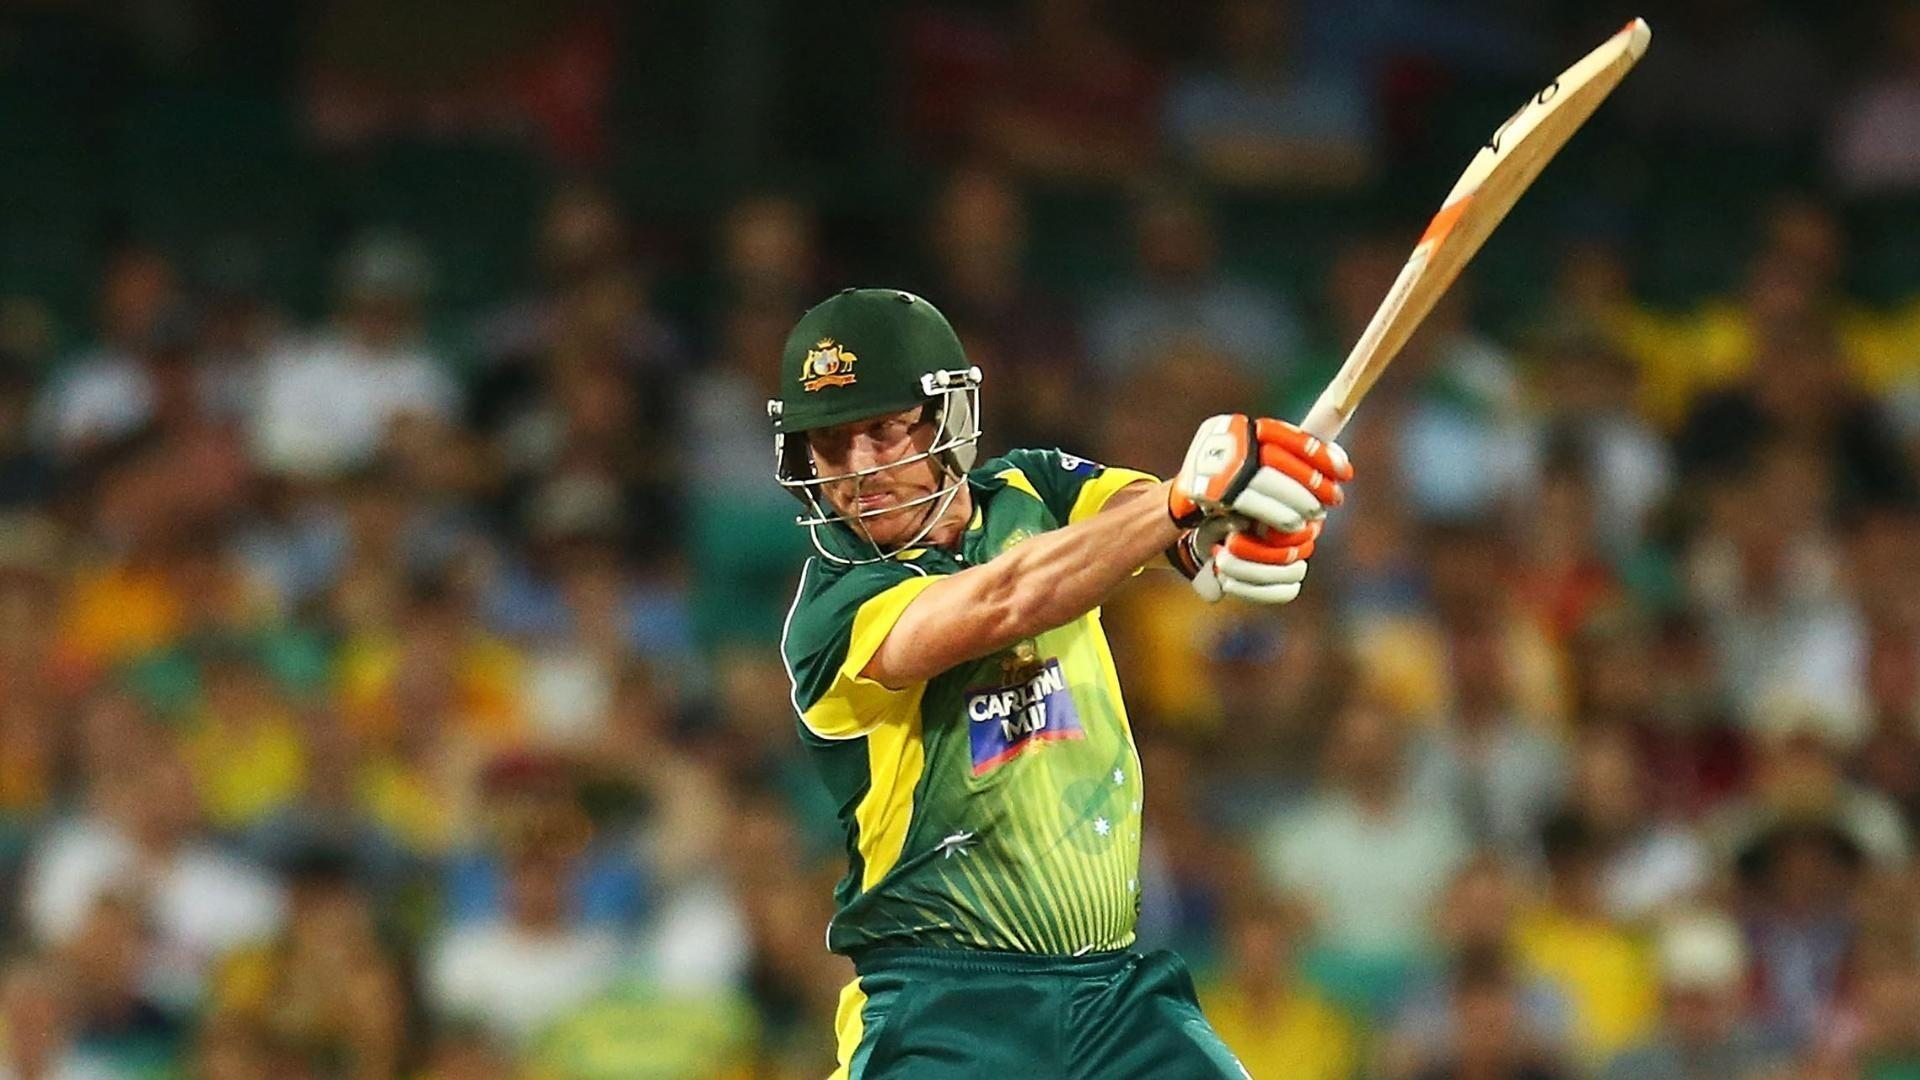 Australian Cricket Team Background 7